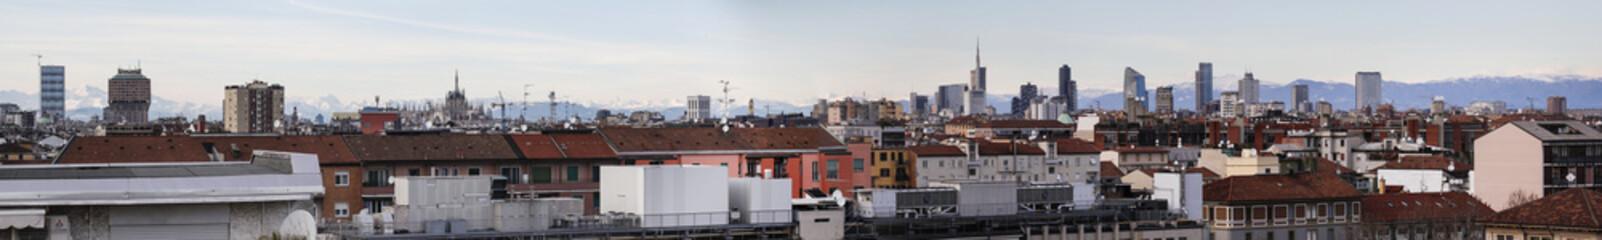 Panoramica su Milano expo 2015